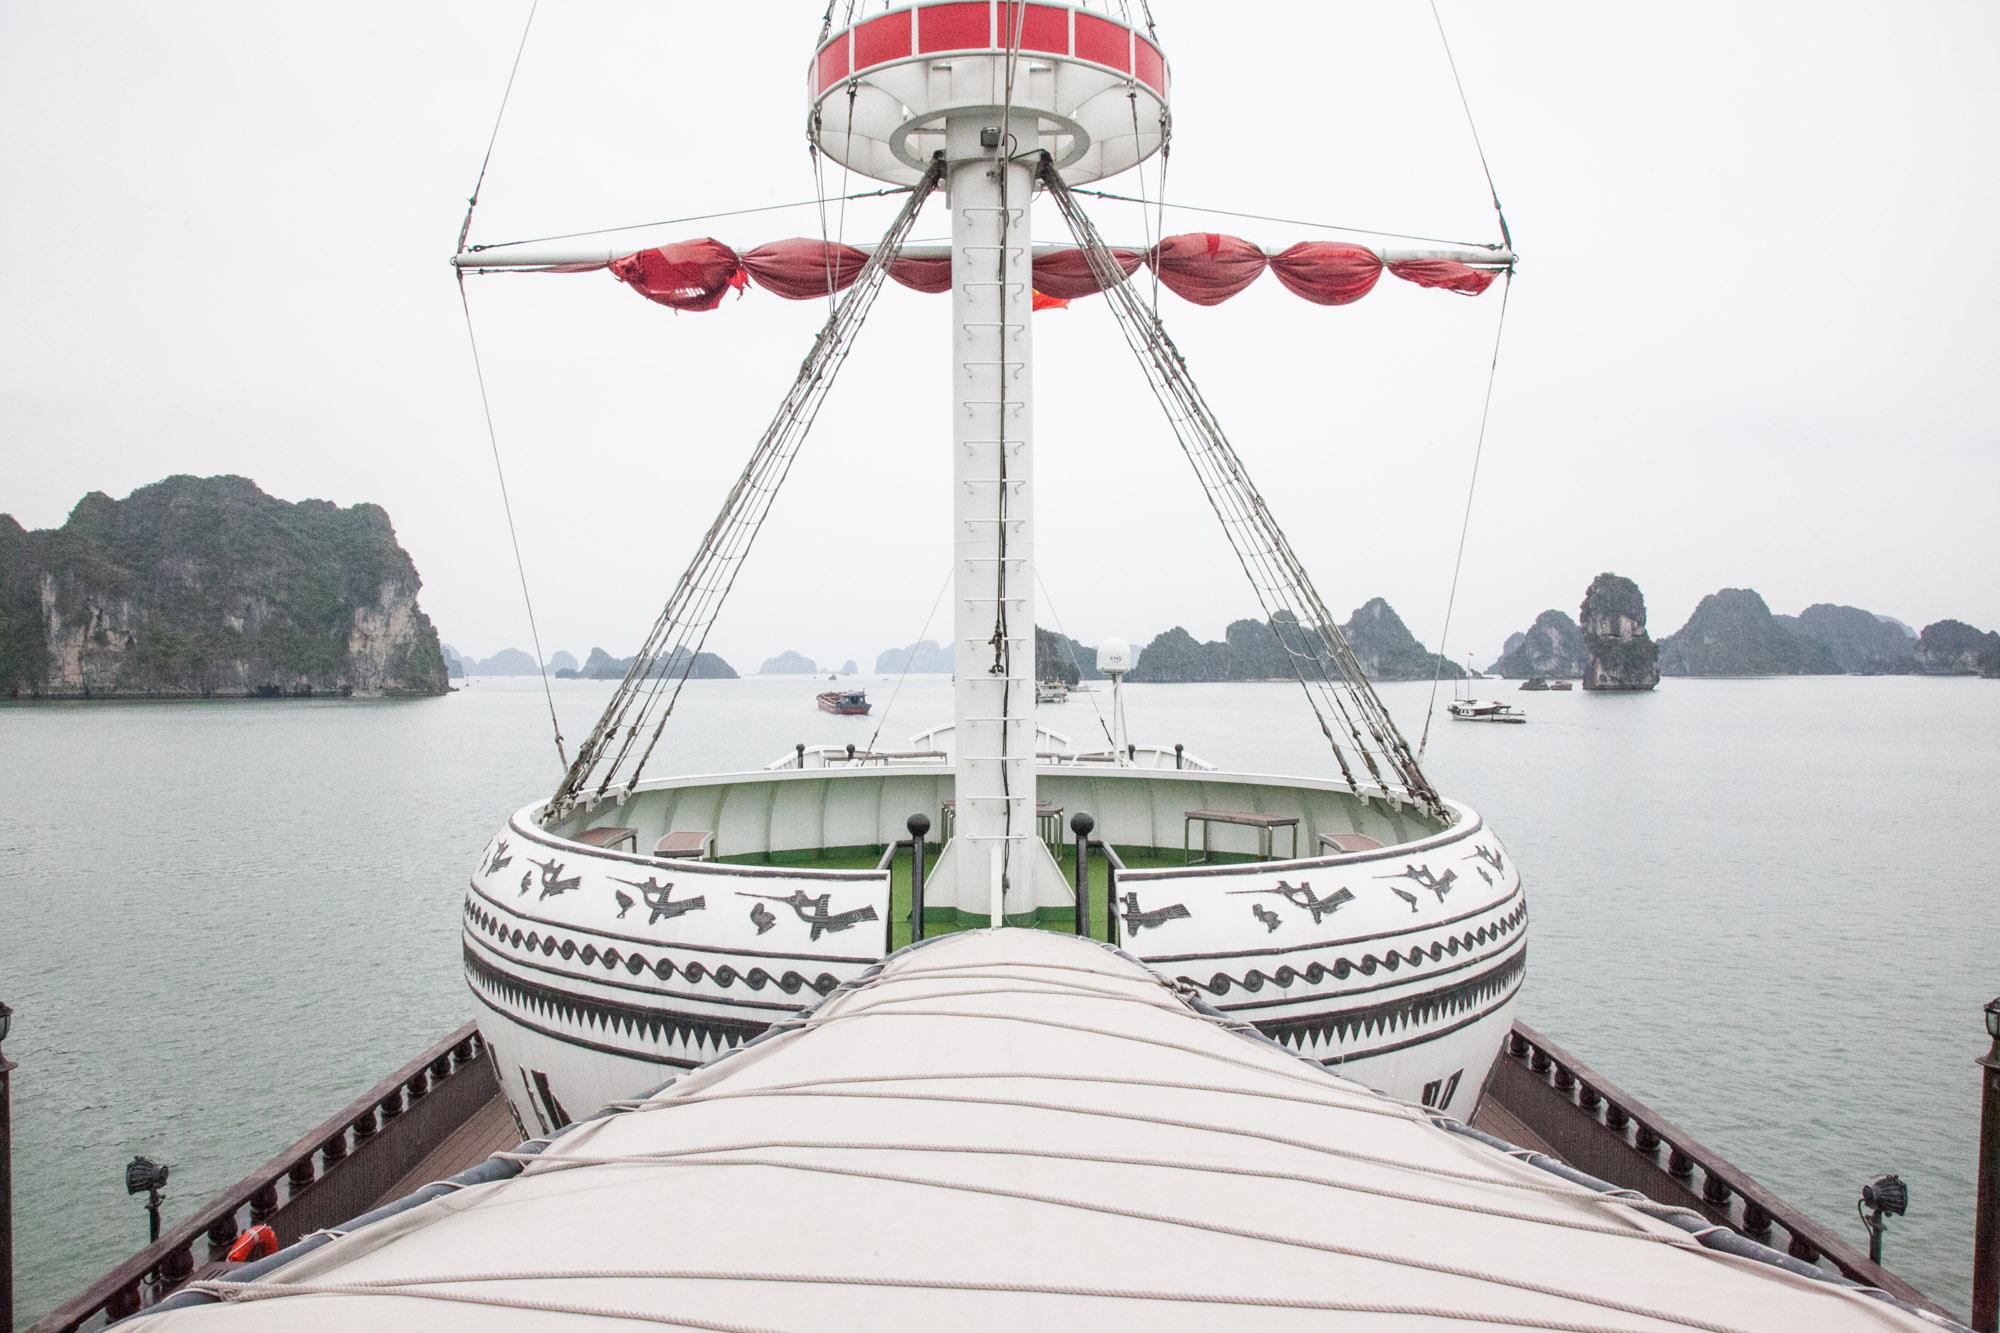 IMG_1383-bai-tu-long-bay-cruise-indochina-junk-vietnam-trisa-taro.jpg